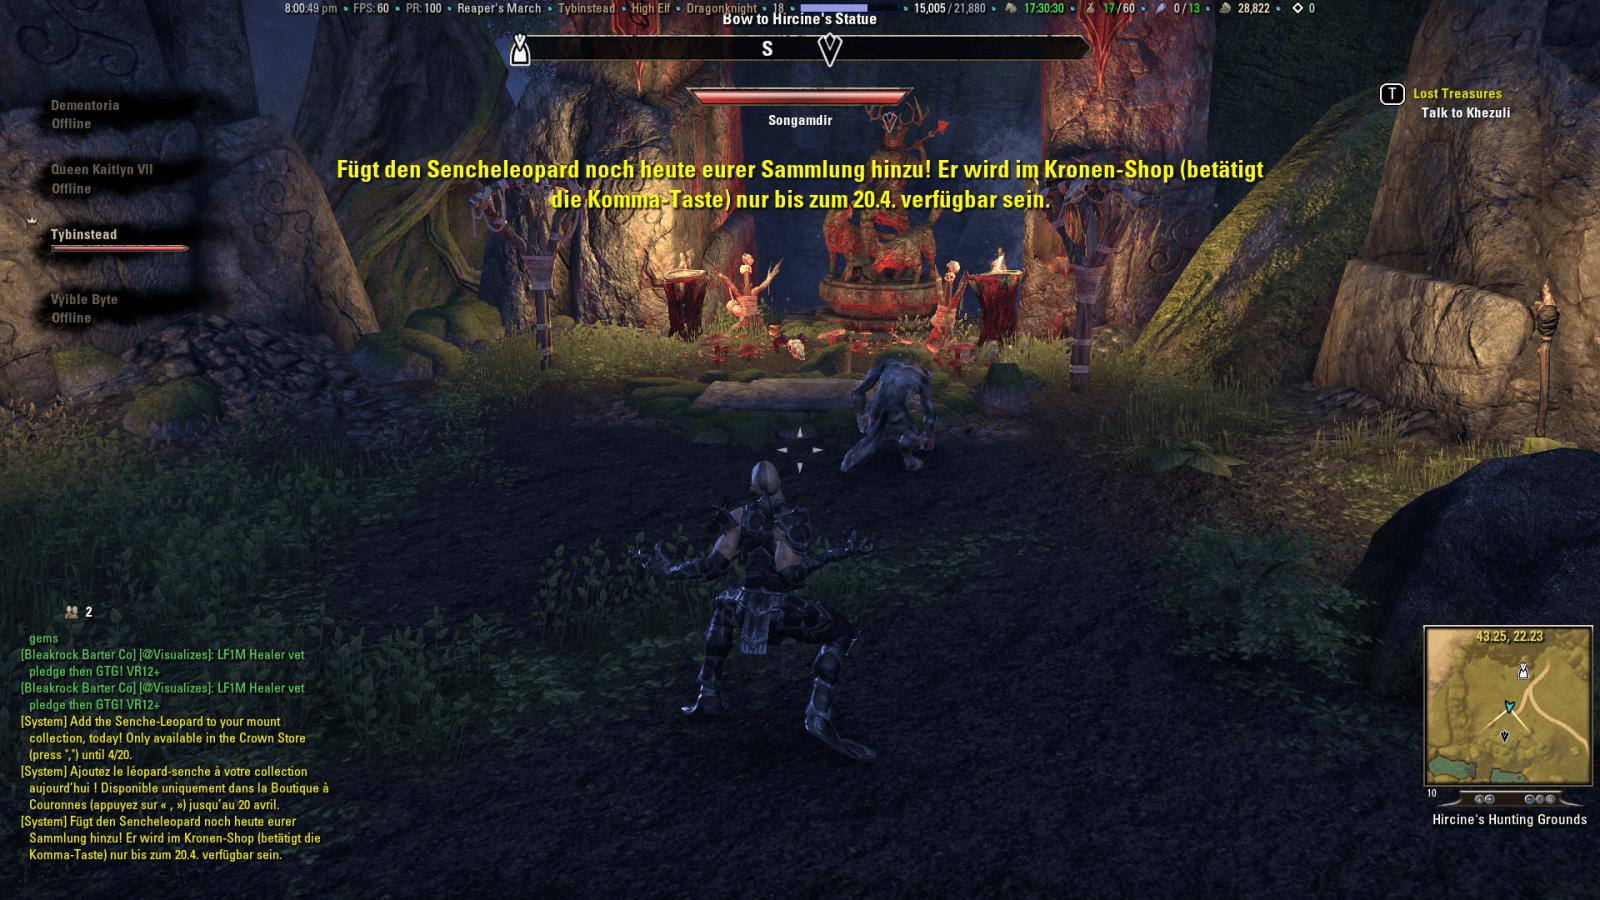 The Elder Scrolls Online: Neon-Schild stört Mittelalter-Idyll